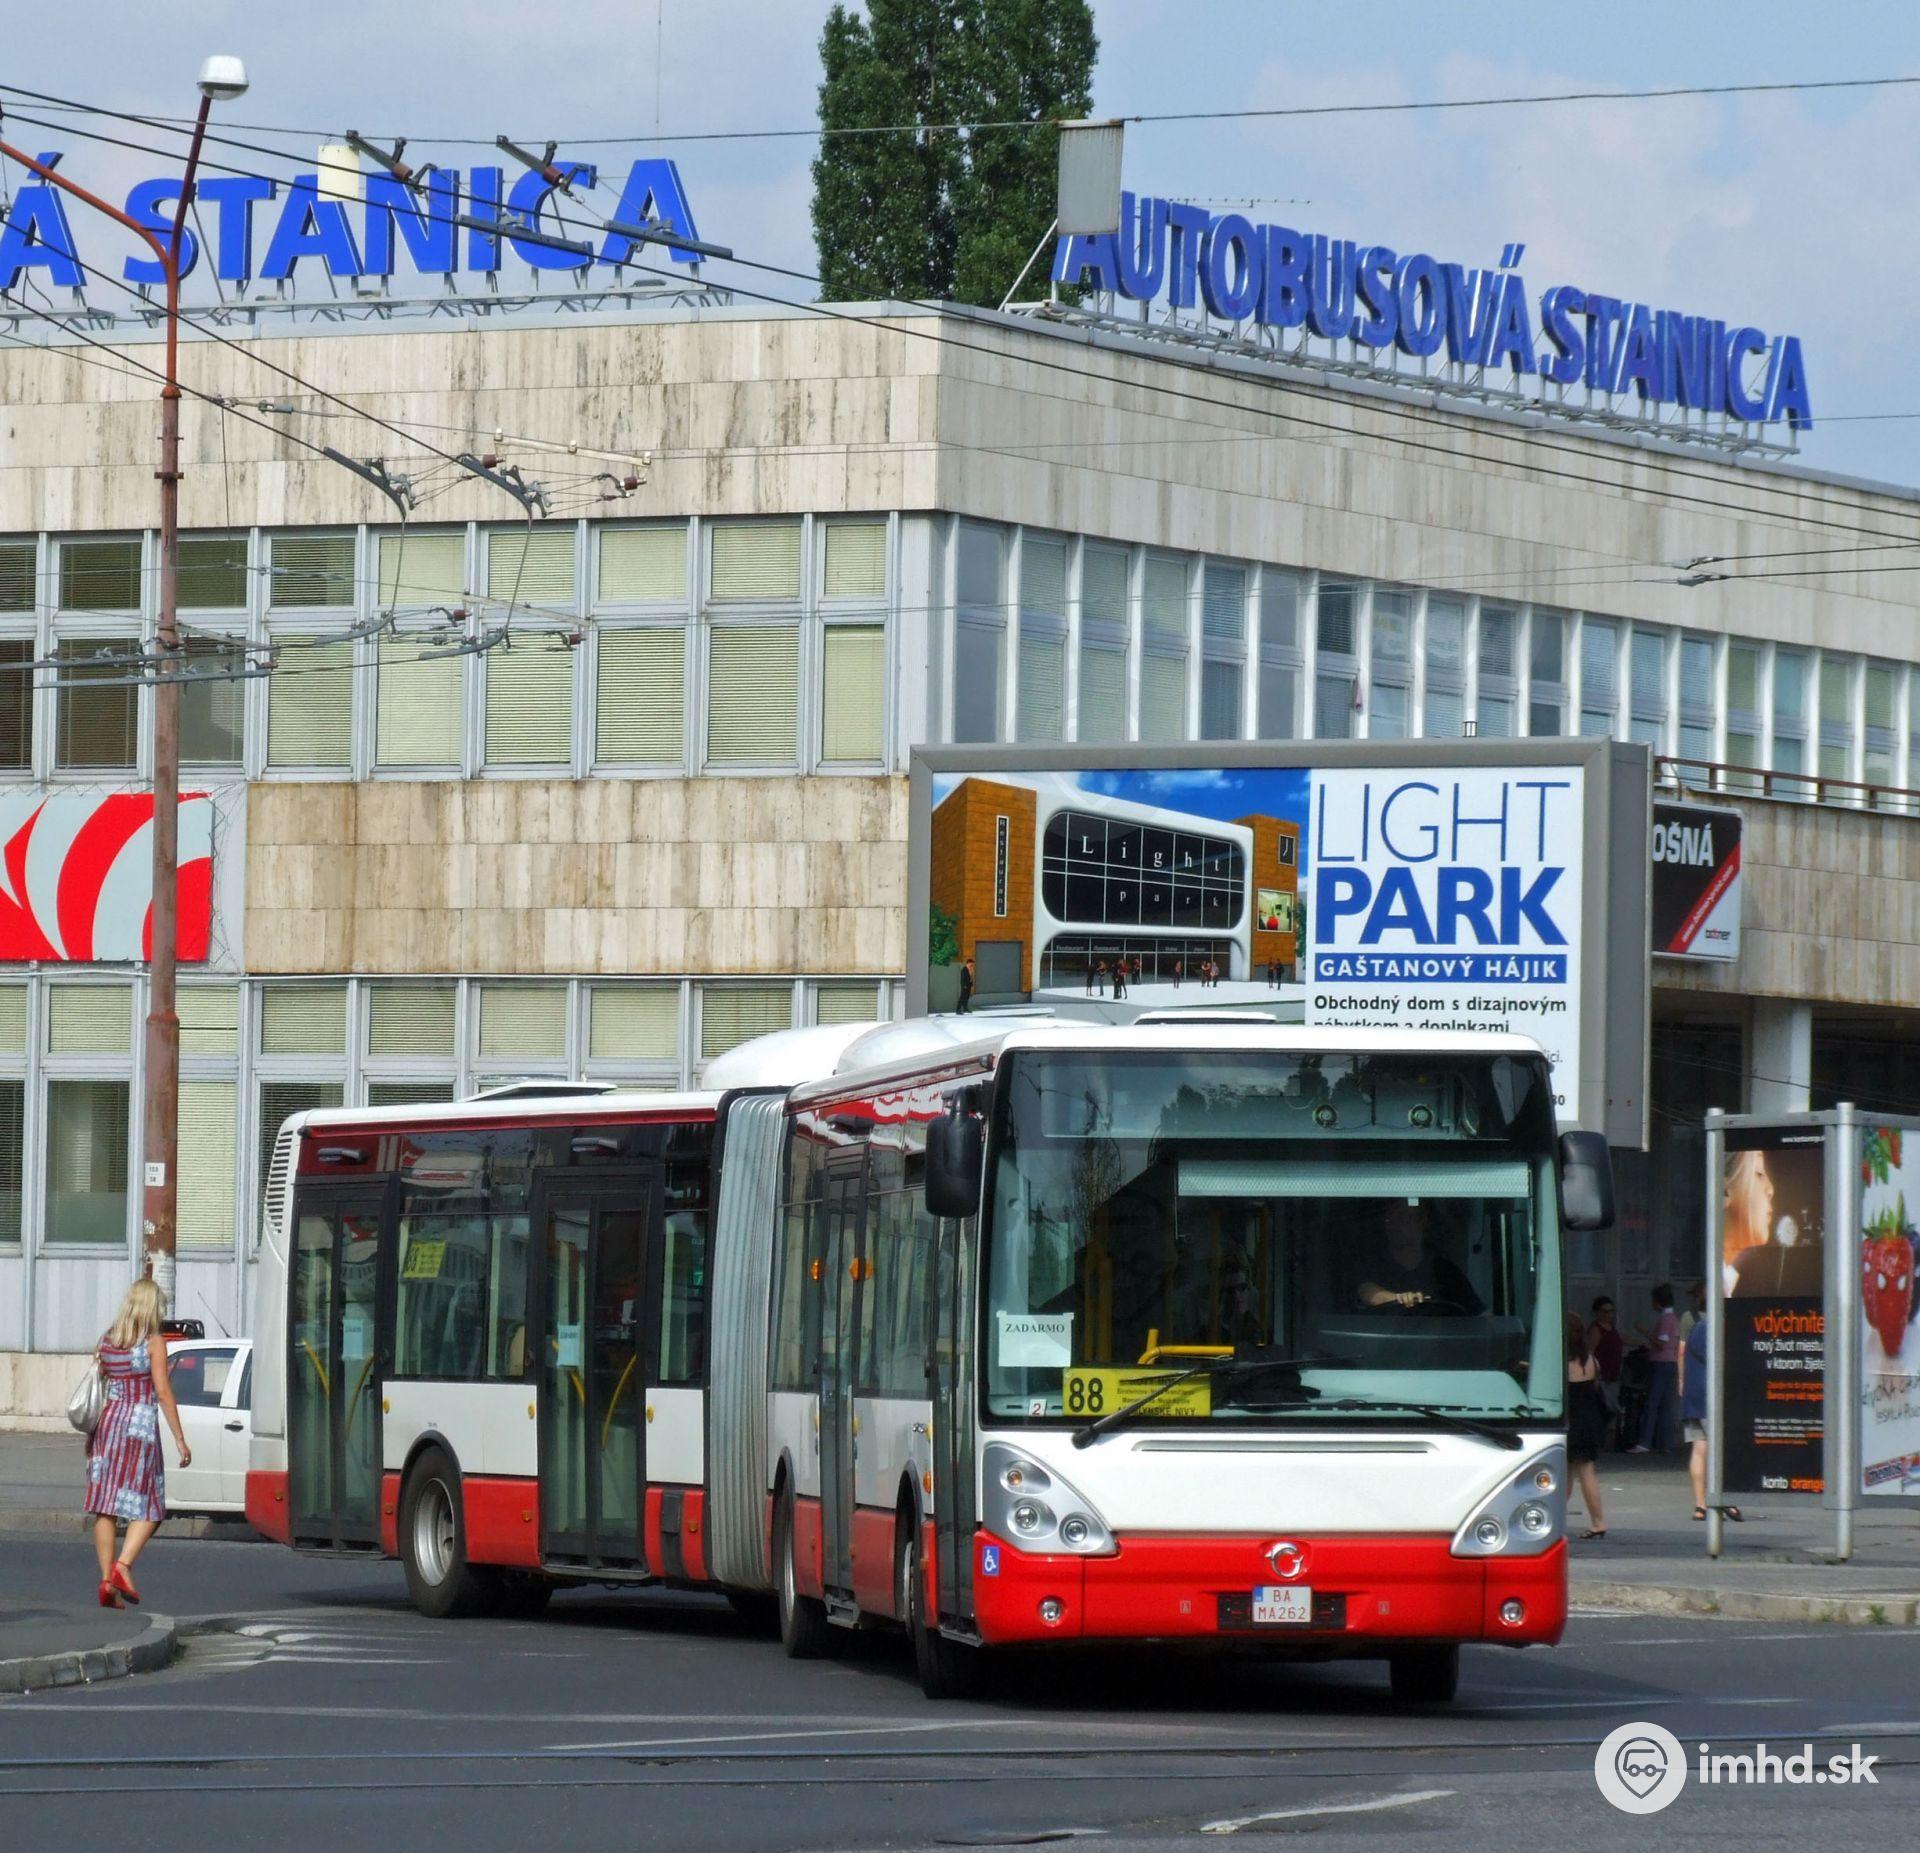 MHD na stanice (do 17.2.2019) • imhd.sk Bratislava dfc972fe170